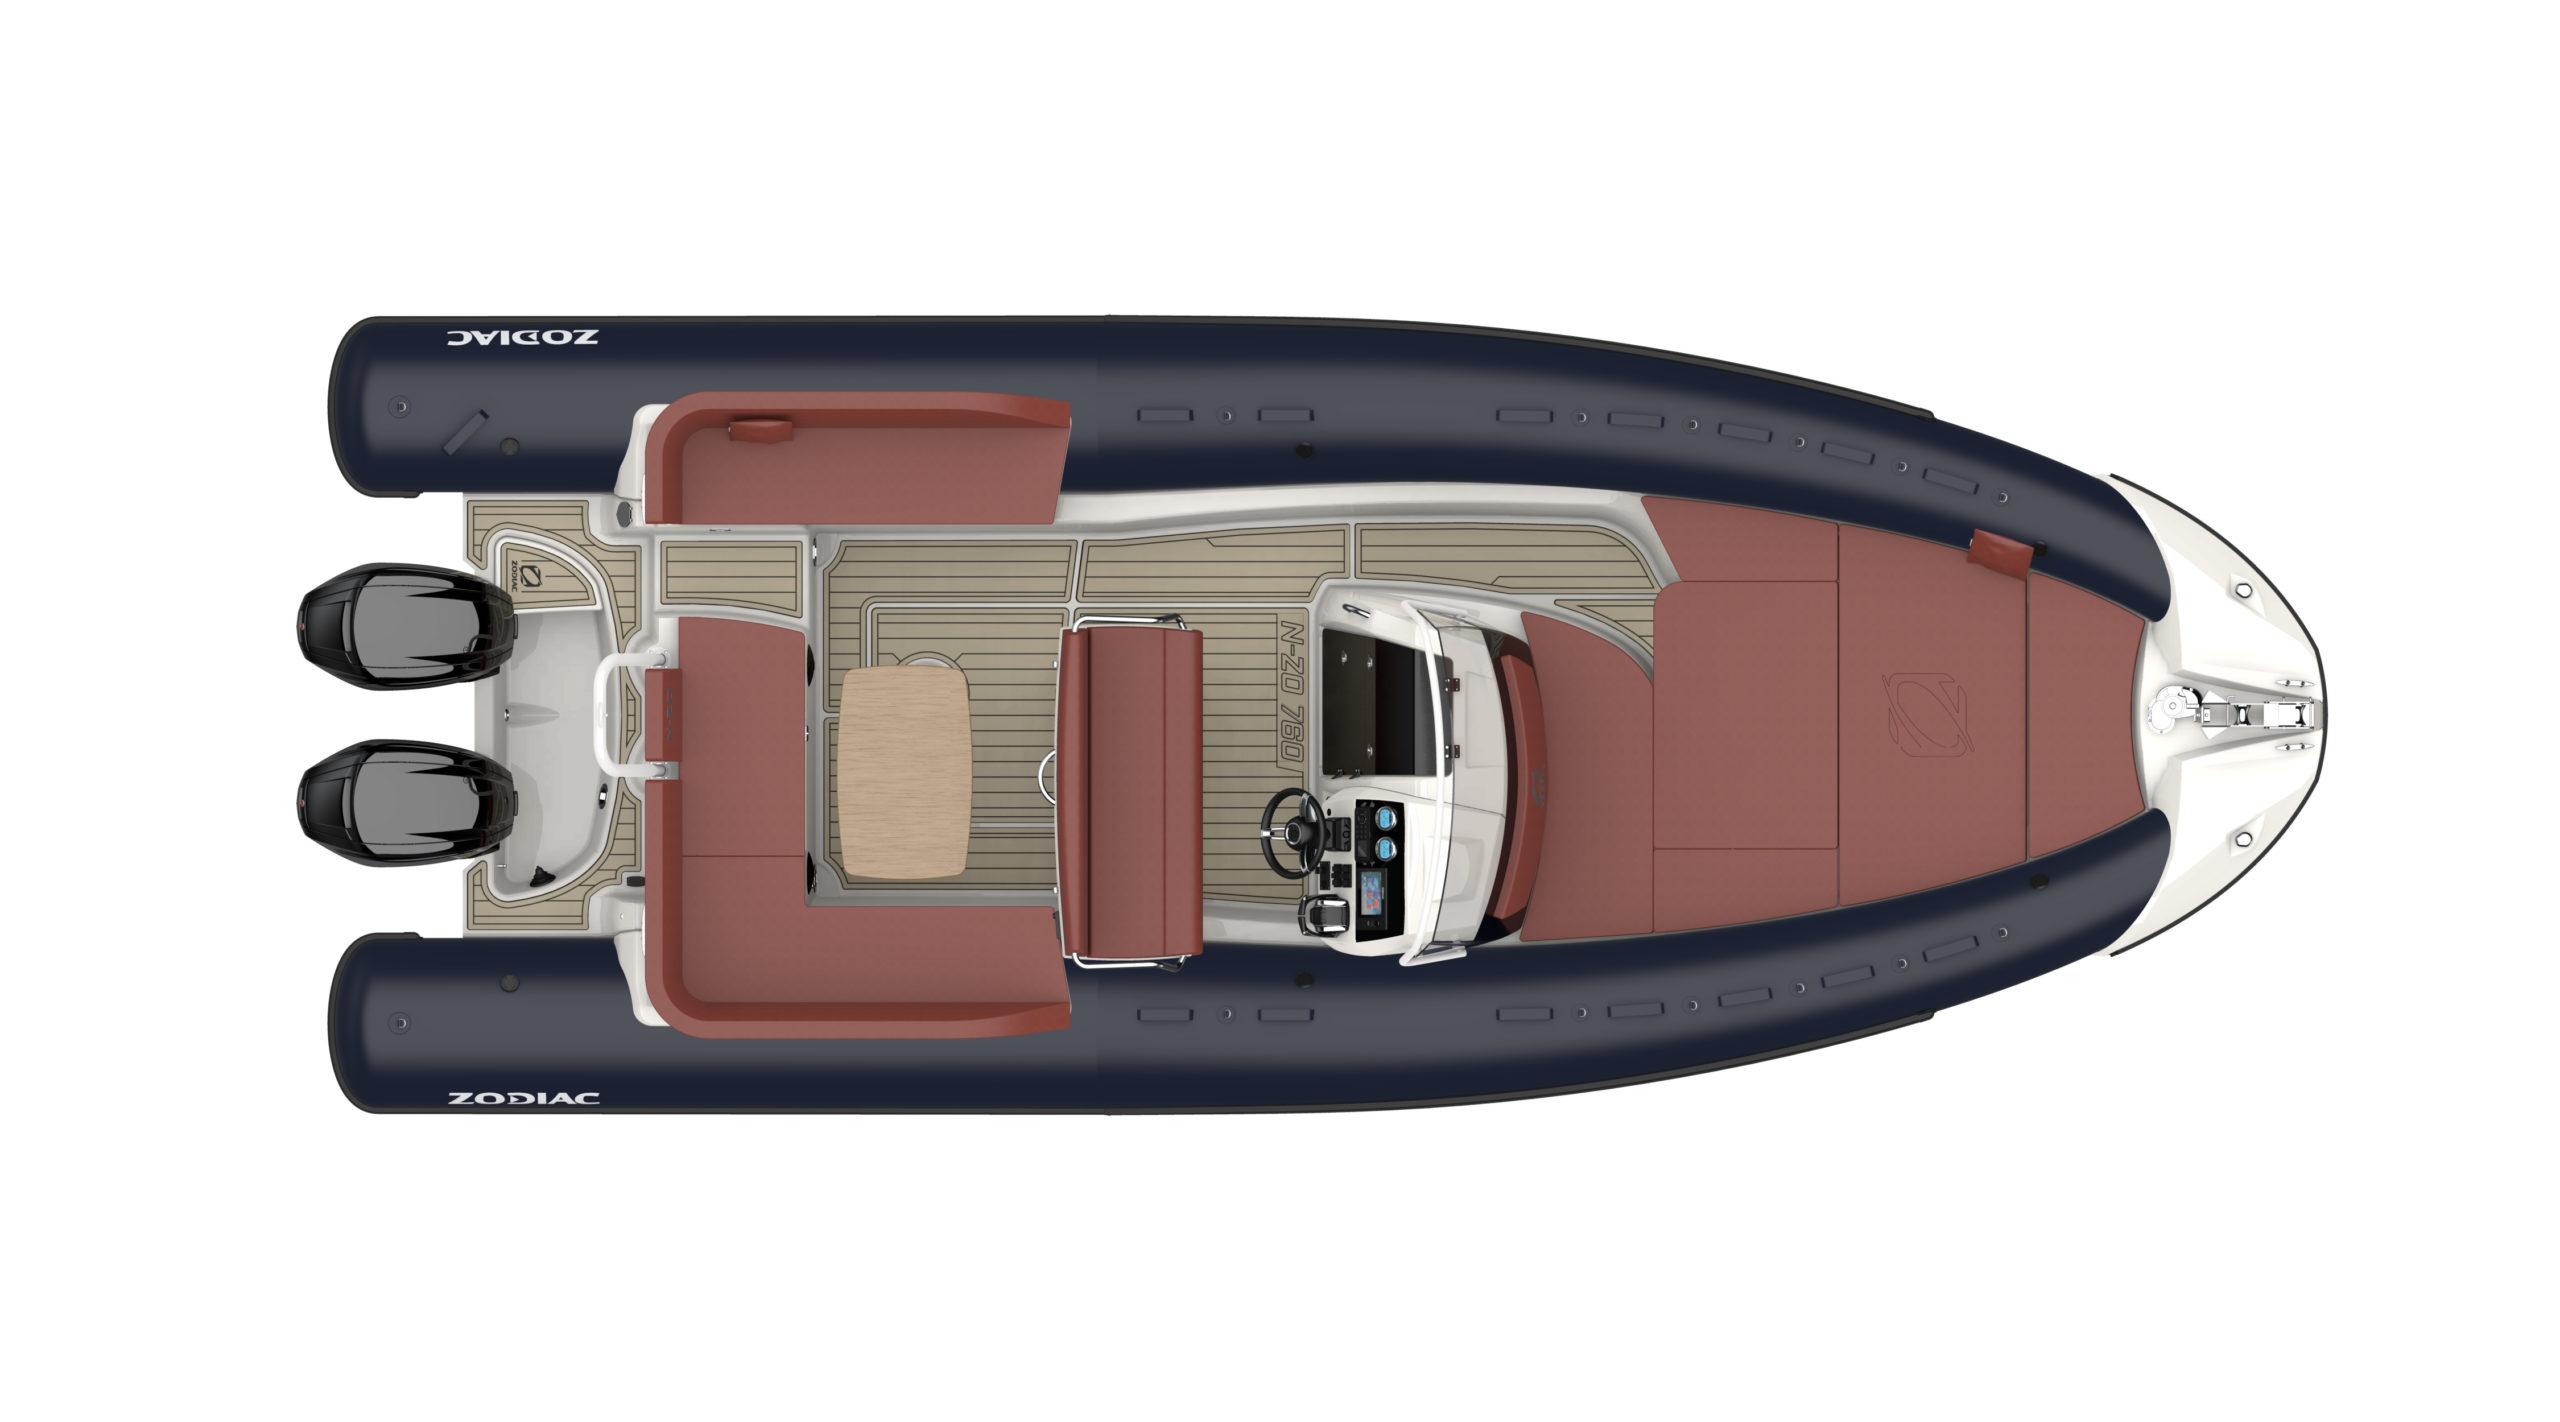 NZO760-Deluxe-pack_9010-Navy-Terracotta-blanc_P4